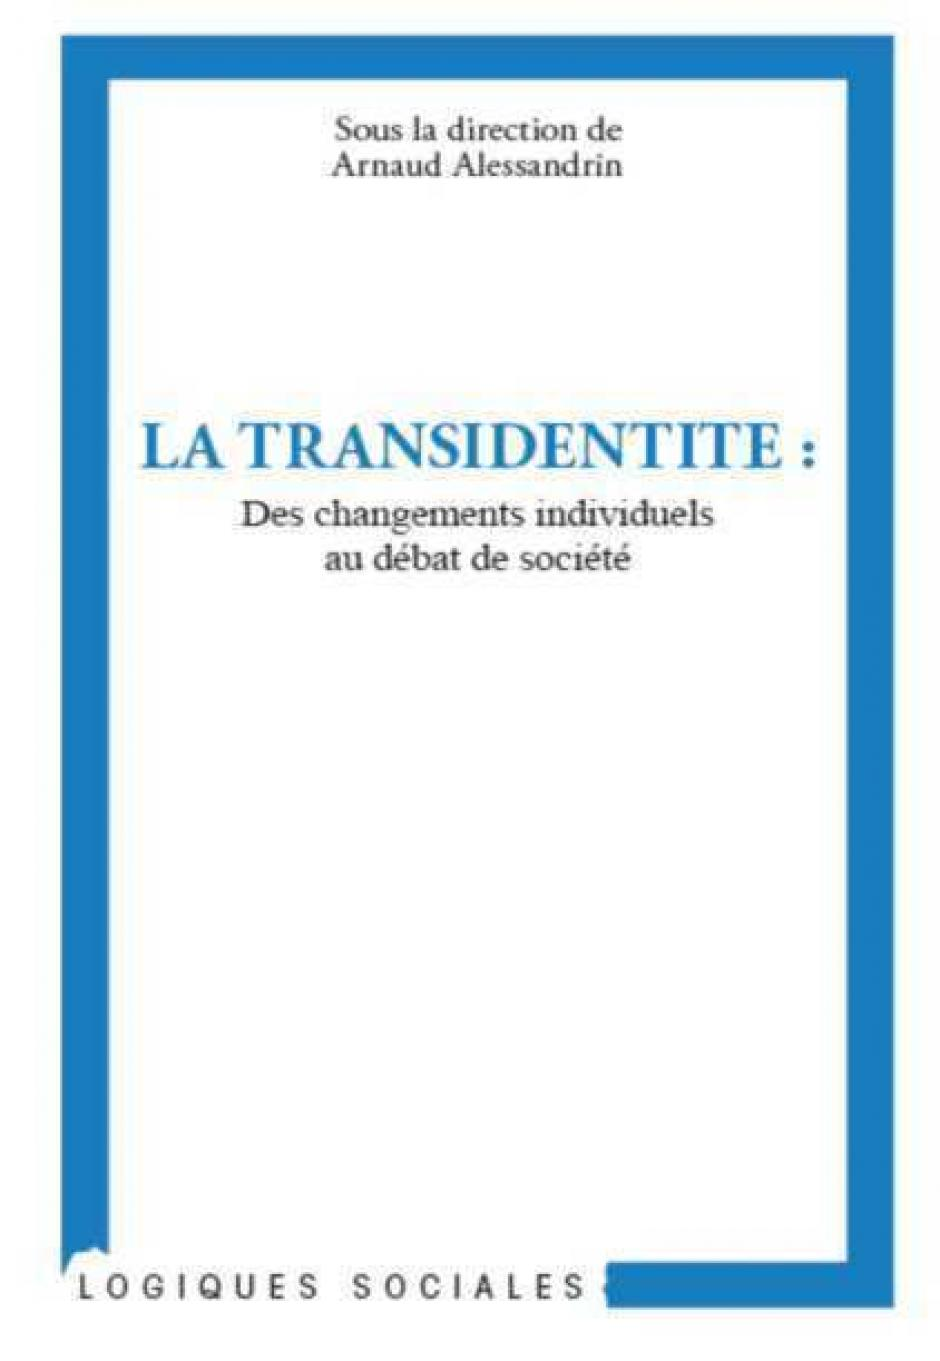 LA QUESTION TRANS' : CONSTATS ET PERSPECTIVES, Arnaud Alessandrin*